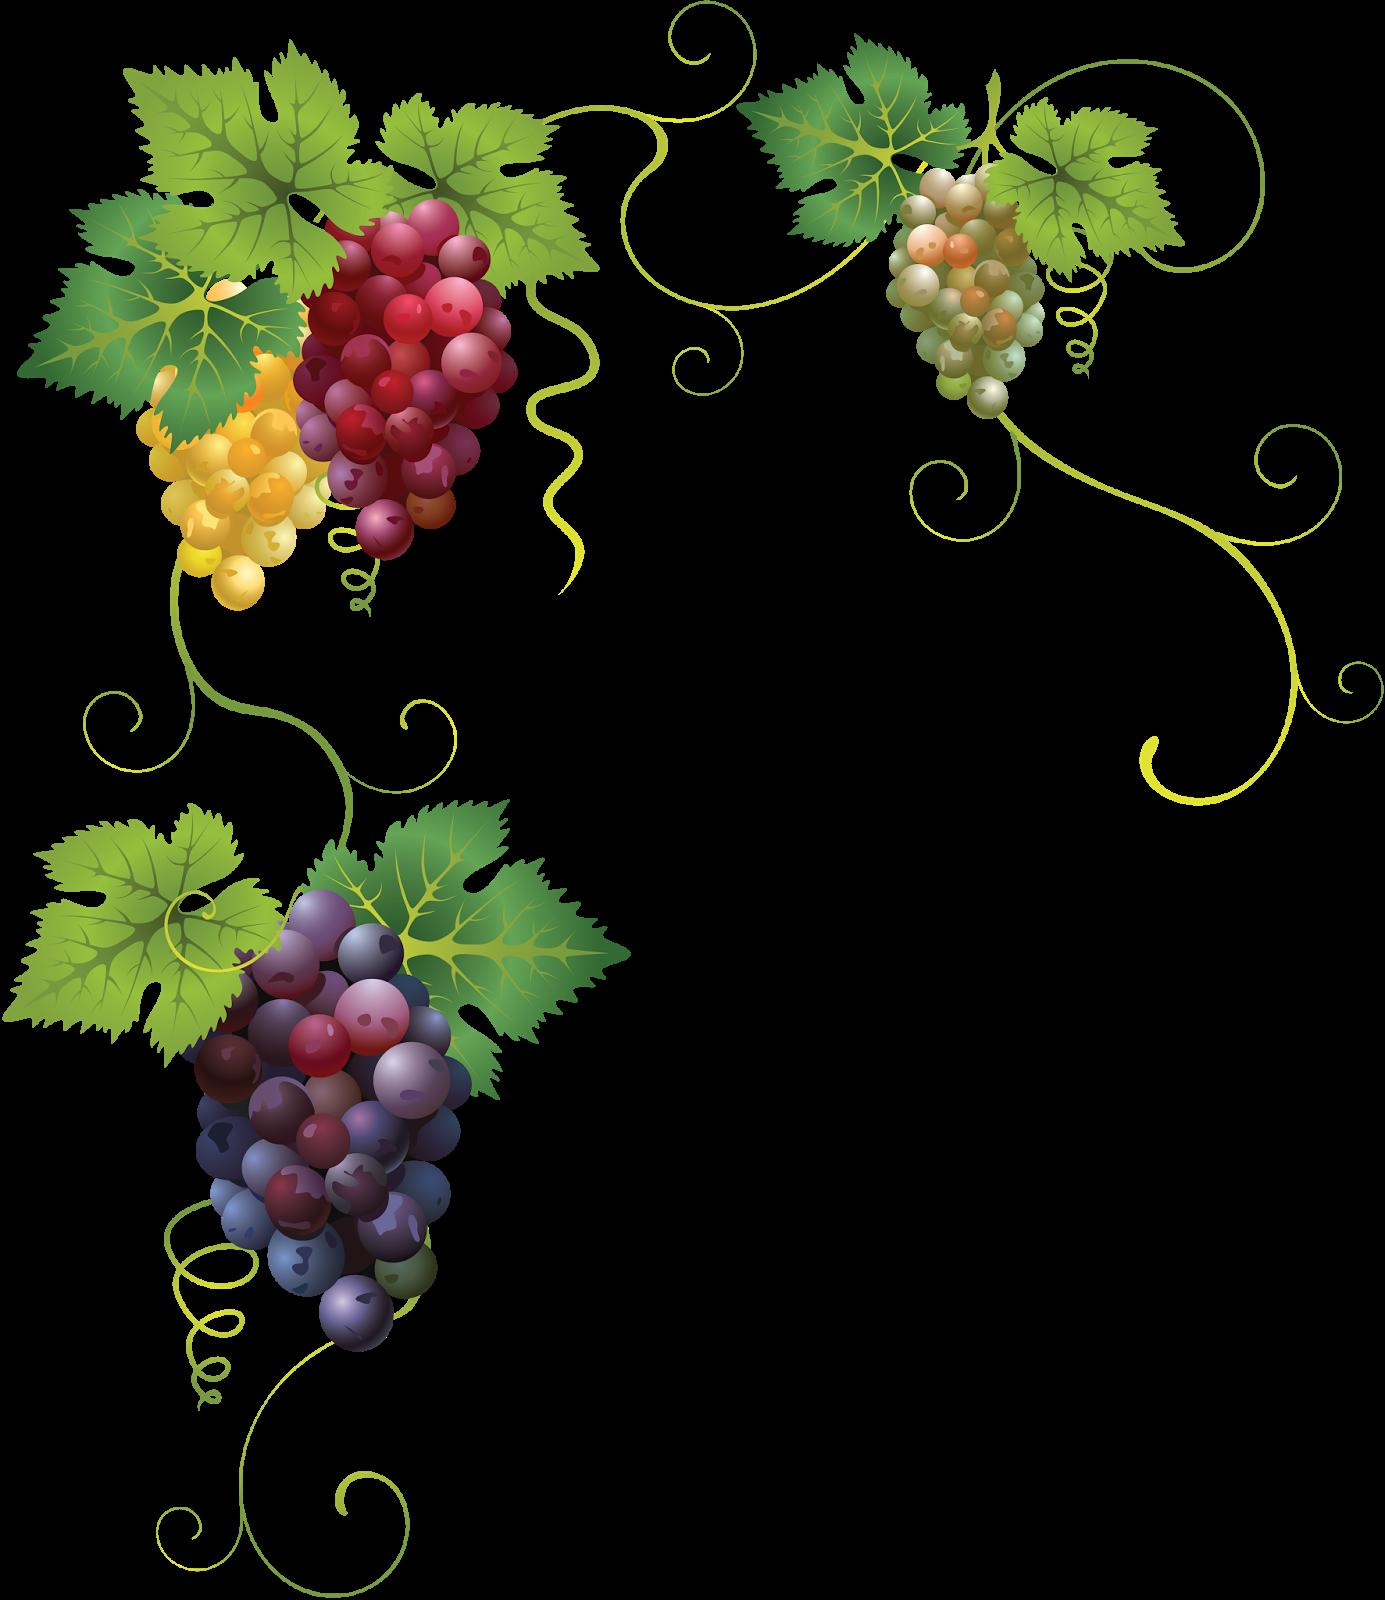 Grapevine clipart pattern. Transparent background grape